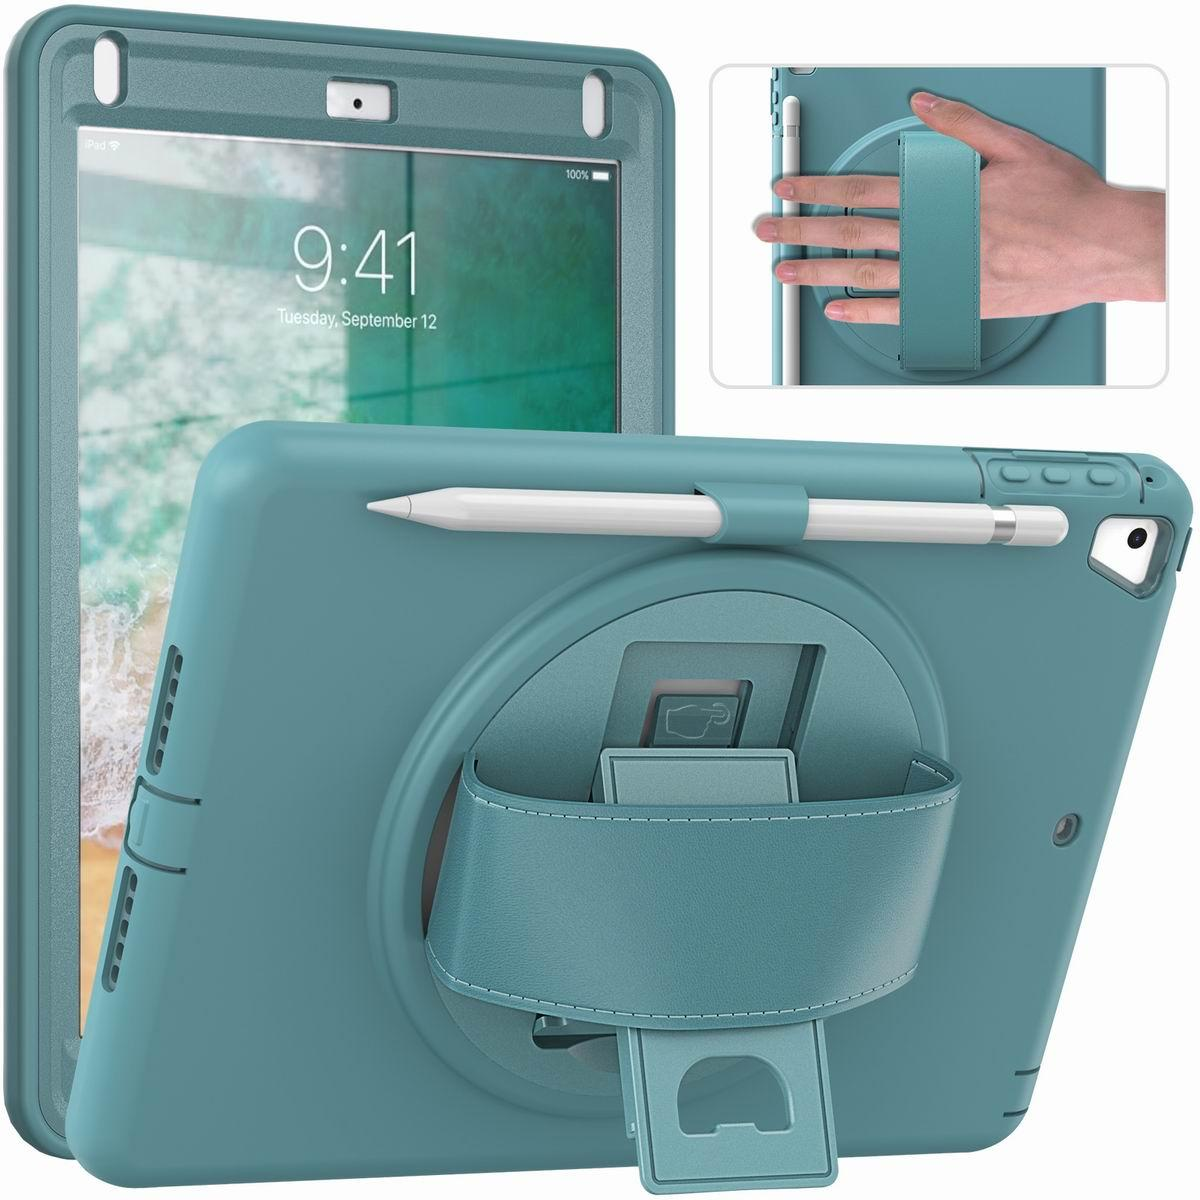 1pcs Heavy Duty TPU iPad Case For 7th Generation 9.7 12.9 6th 10.5 Air 3 Pro 11 Mini3 4 5 6 Smart Cover